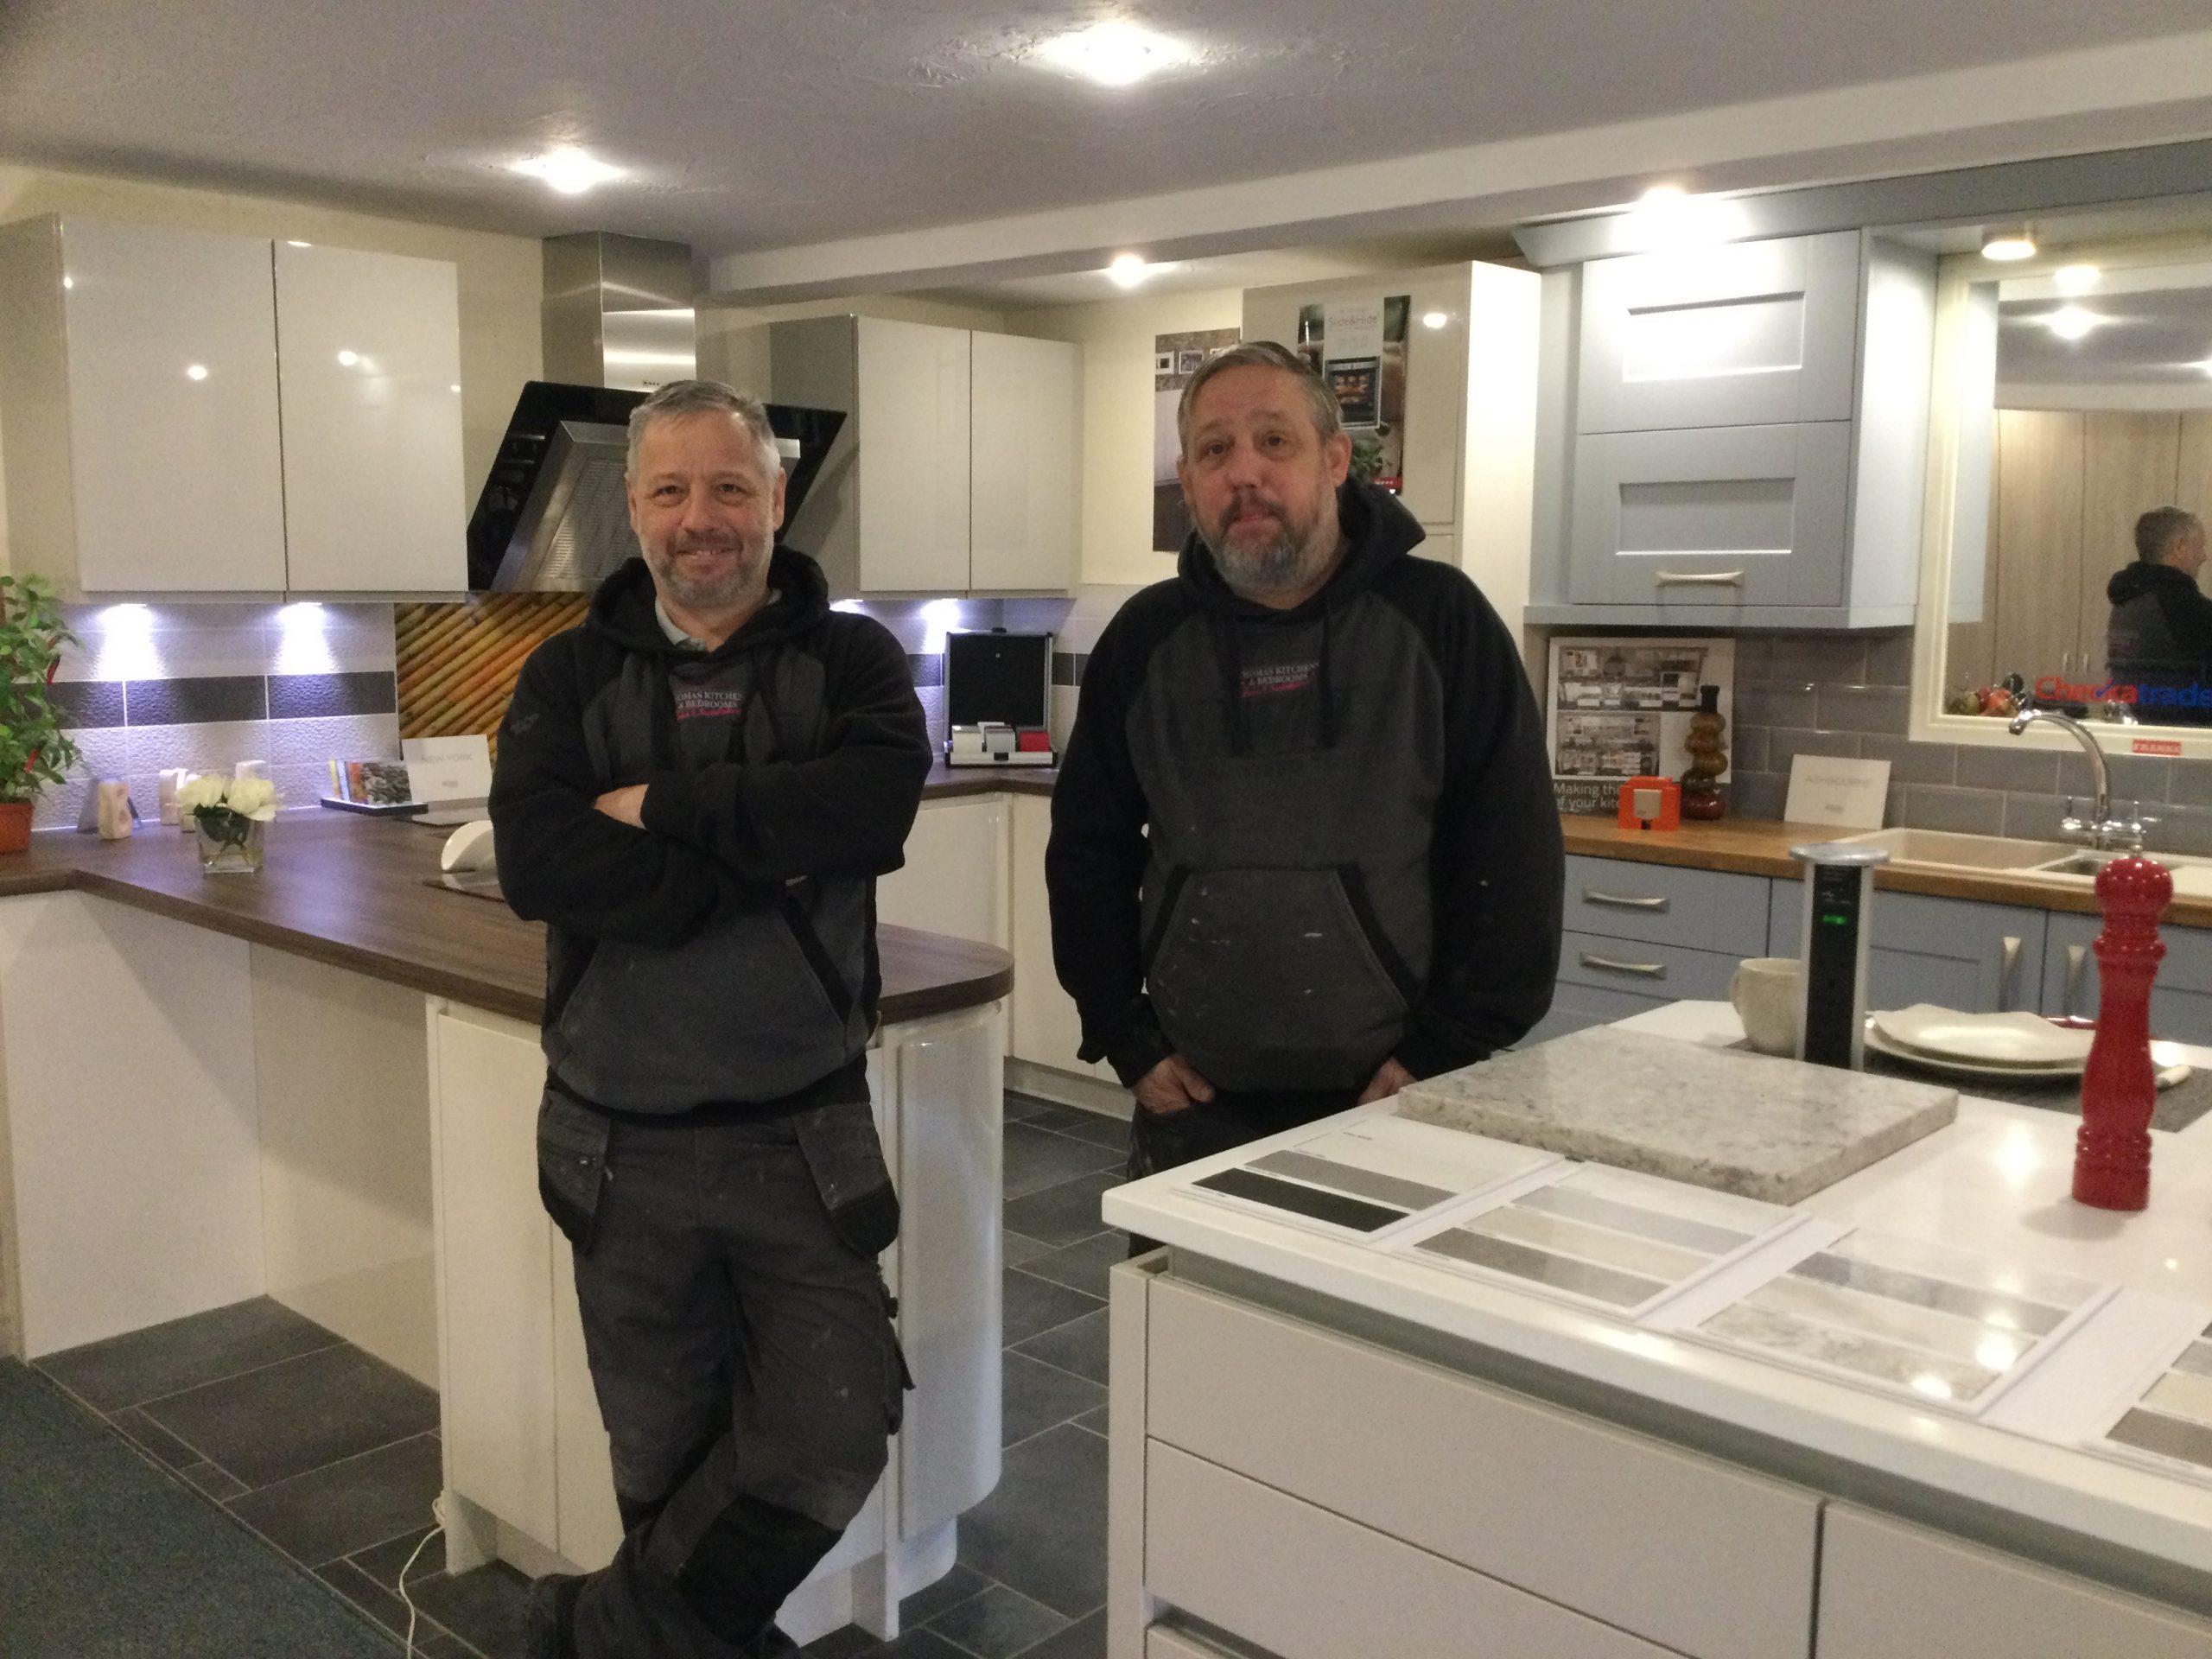 Peter Aston & Graham Aston <small>Fitter / Carpenters</small>